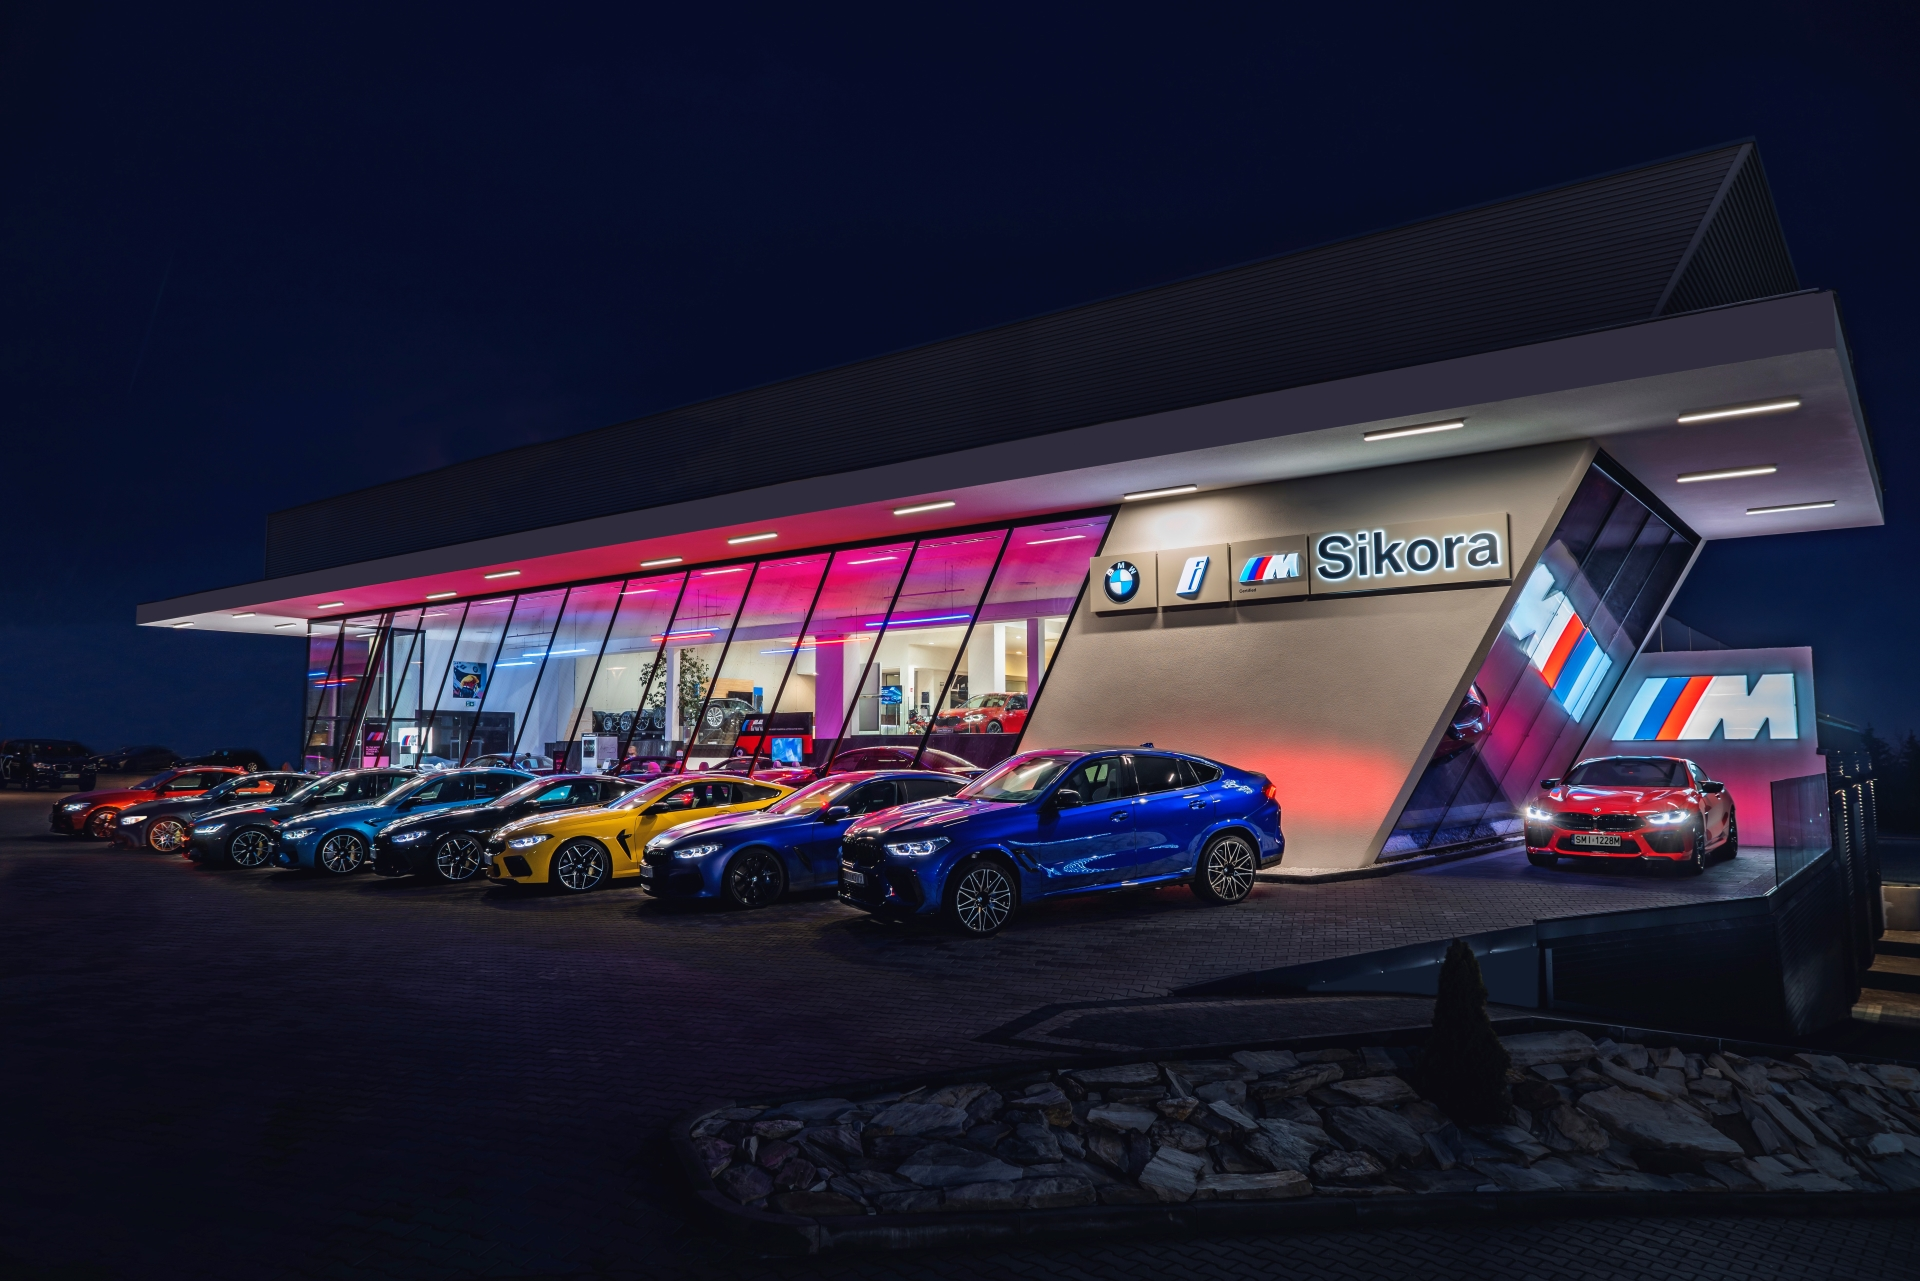 BMW M Sikora showroom in Poland 1